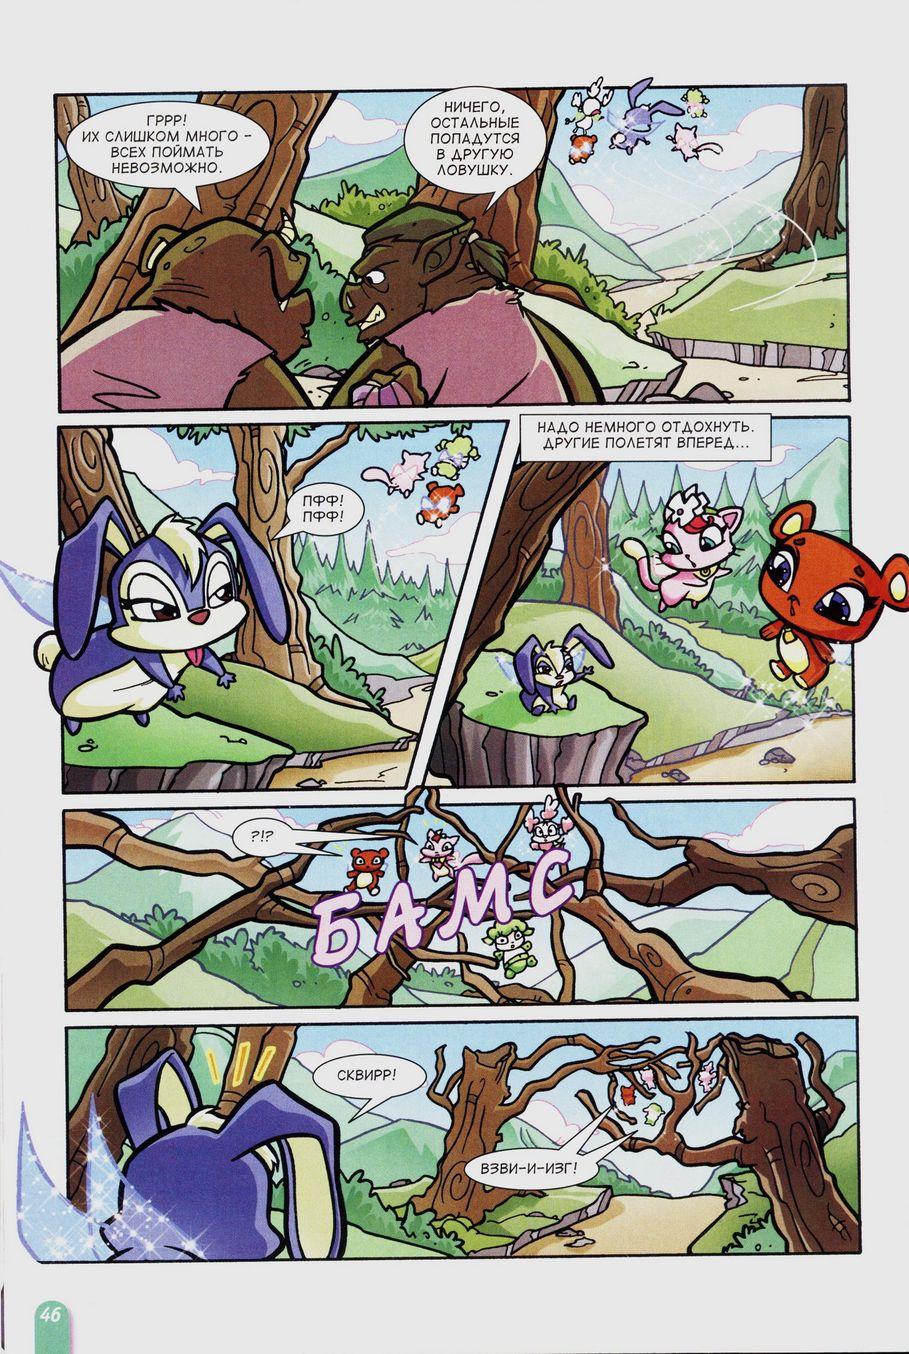 Комикс Винкс Winx - Волшебник Камуд (Журнал Винкс №6 2011) - стр. 46